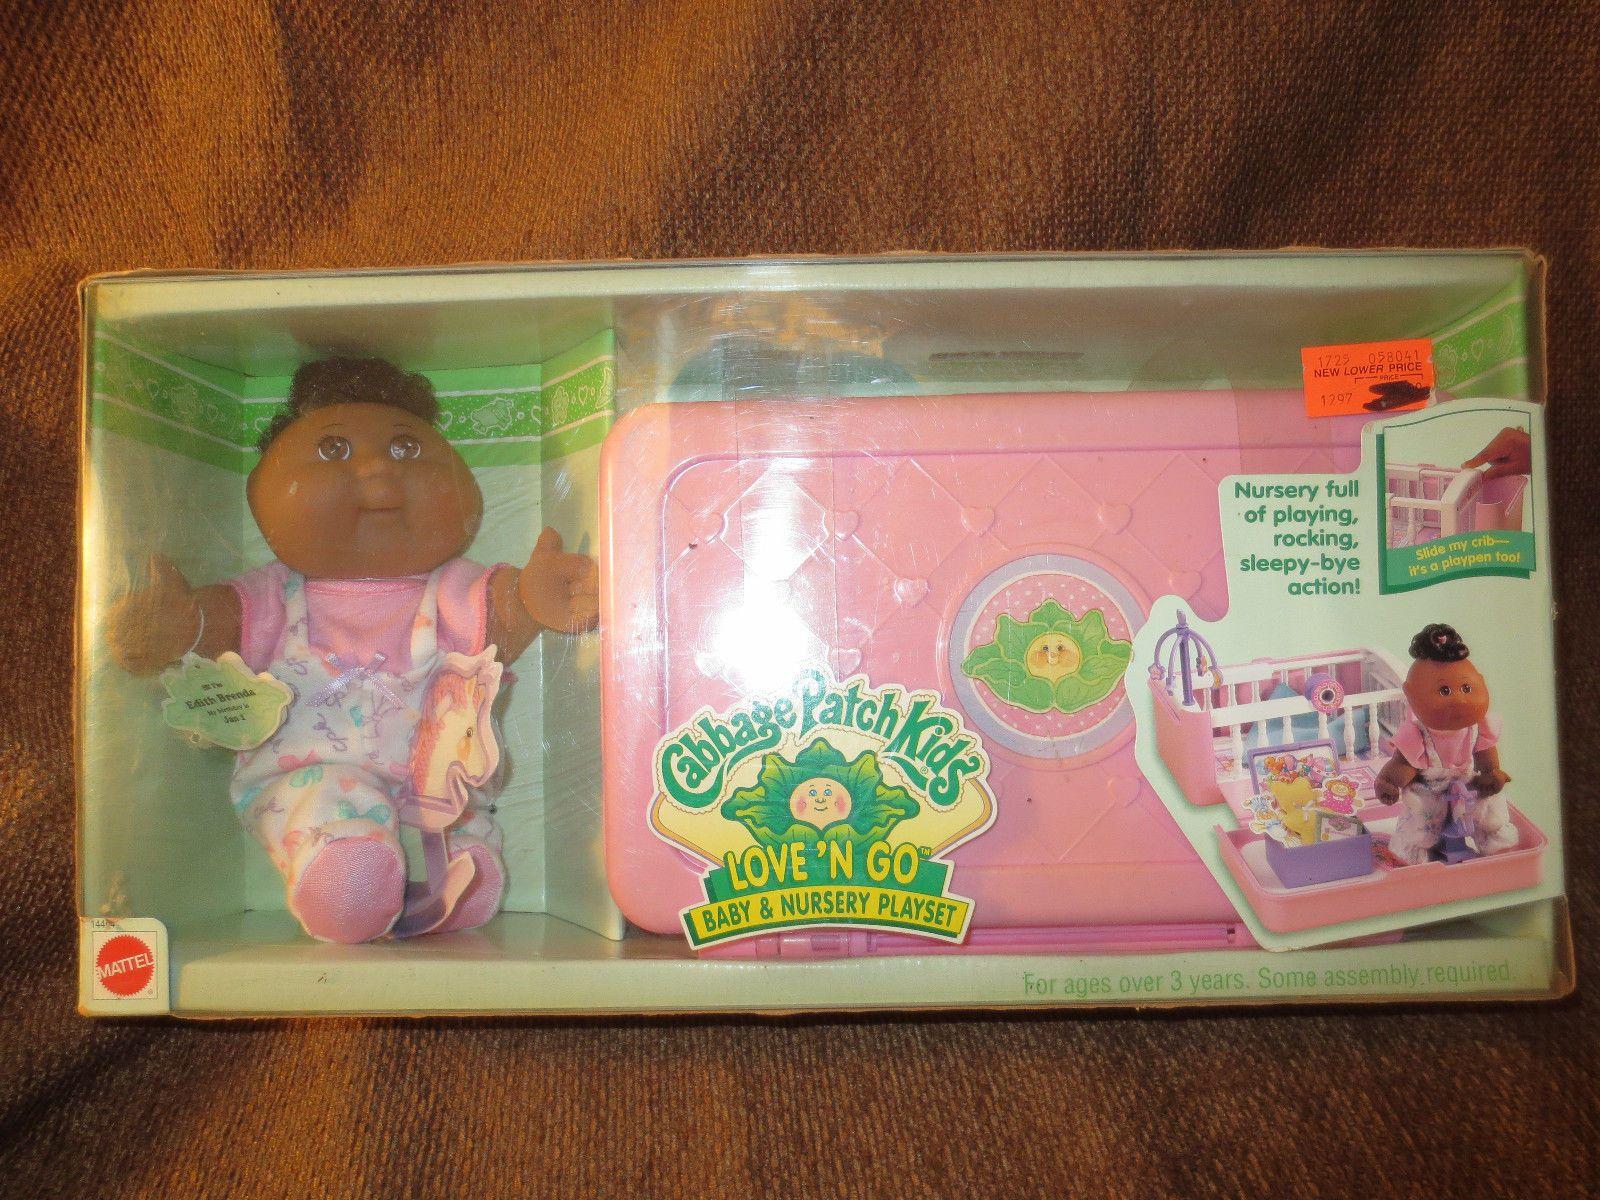 Cabbage Patch Kids Love N Go Baby Nursery Playset 1995 Doll Nib Ebay Cabbage Patch Kids Baby Nursery Playset